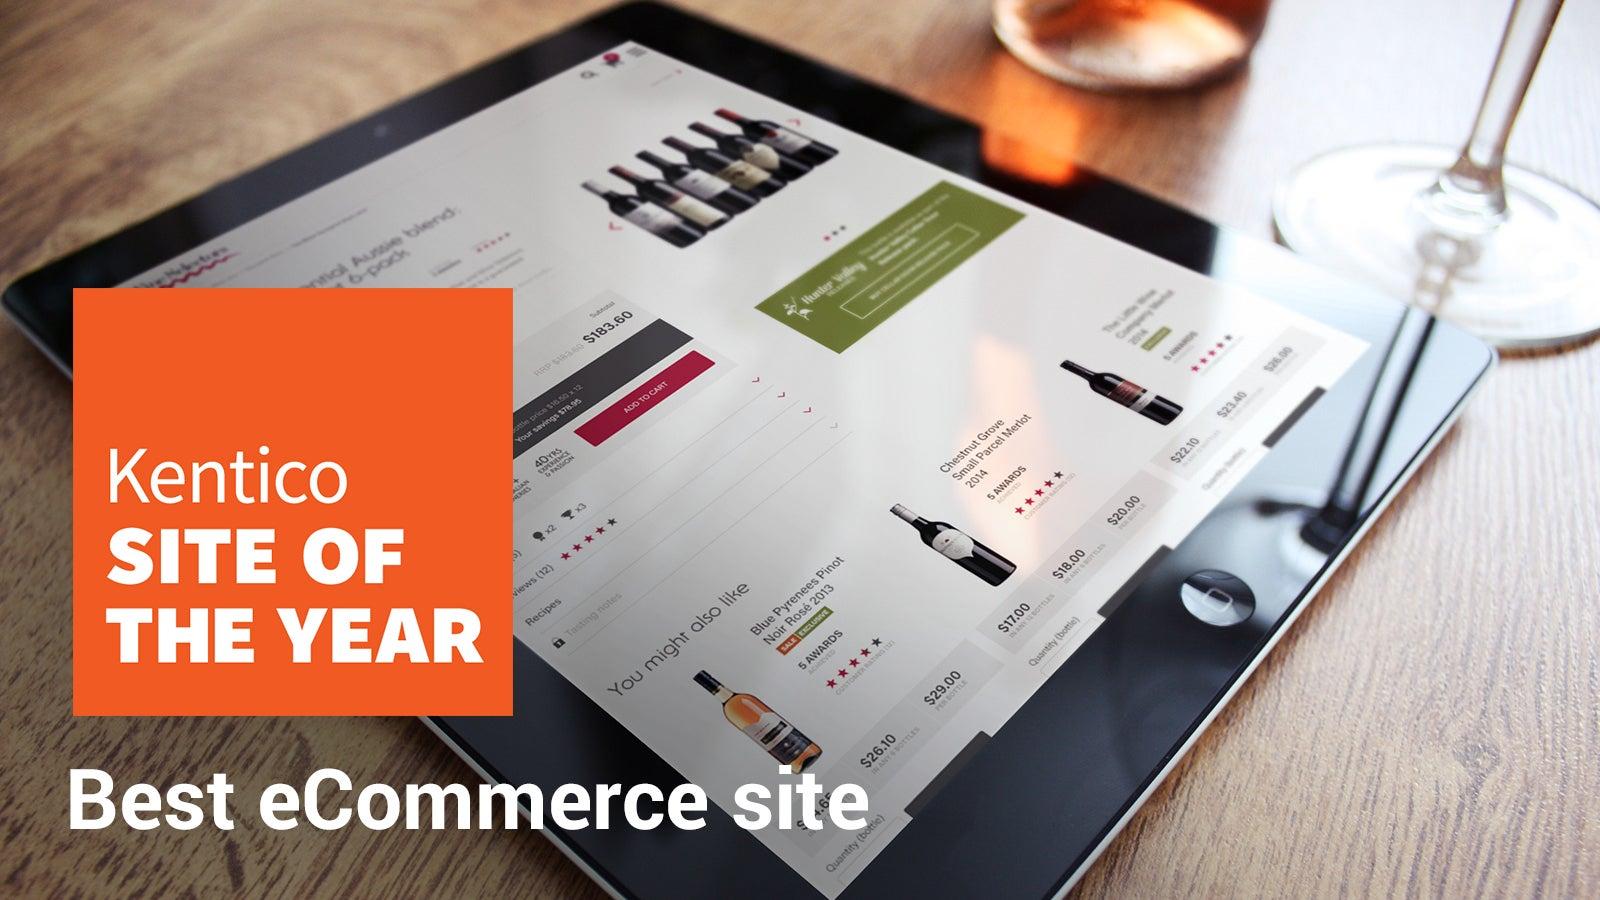 Wine Selectors | Kentico Site of the Year Best eCommerce Site award over Wine Selectors website on iPad | Devotion